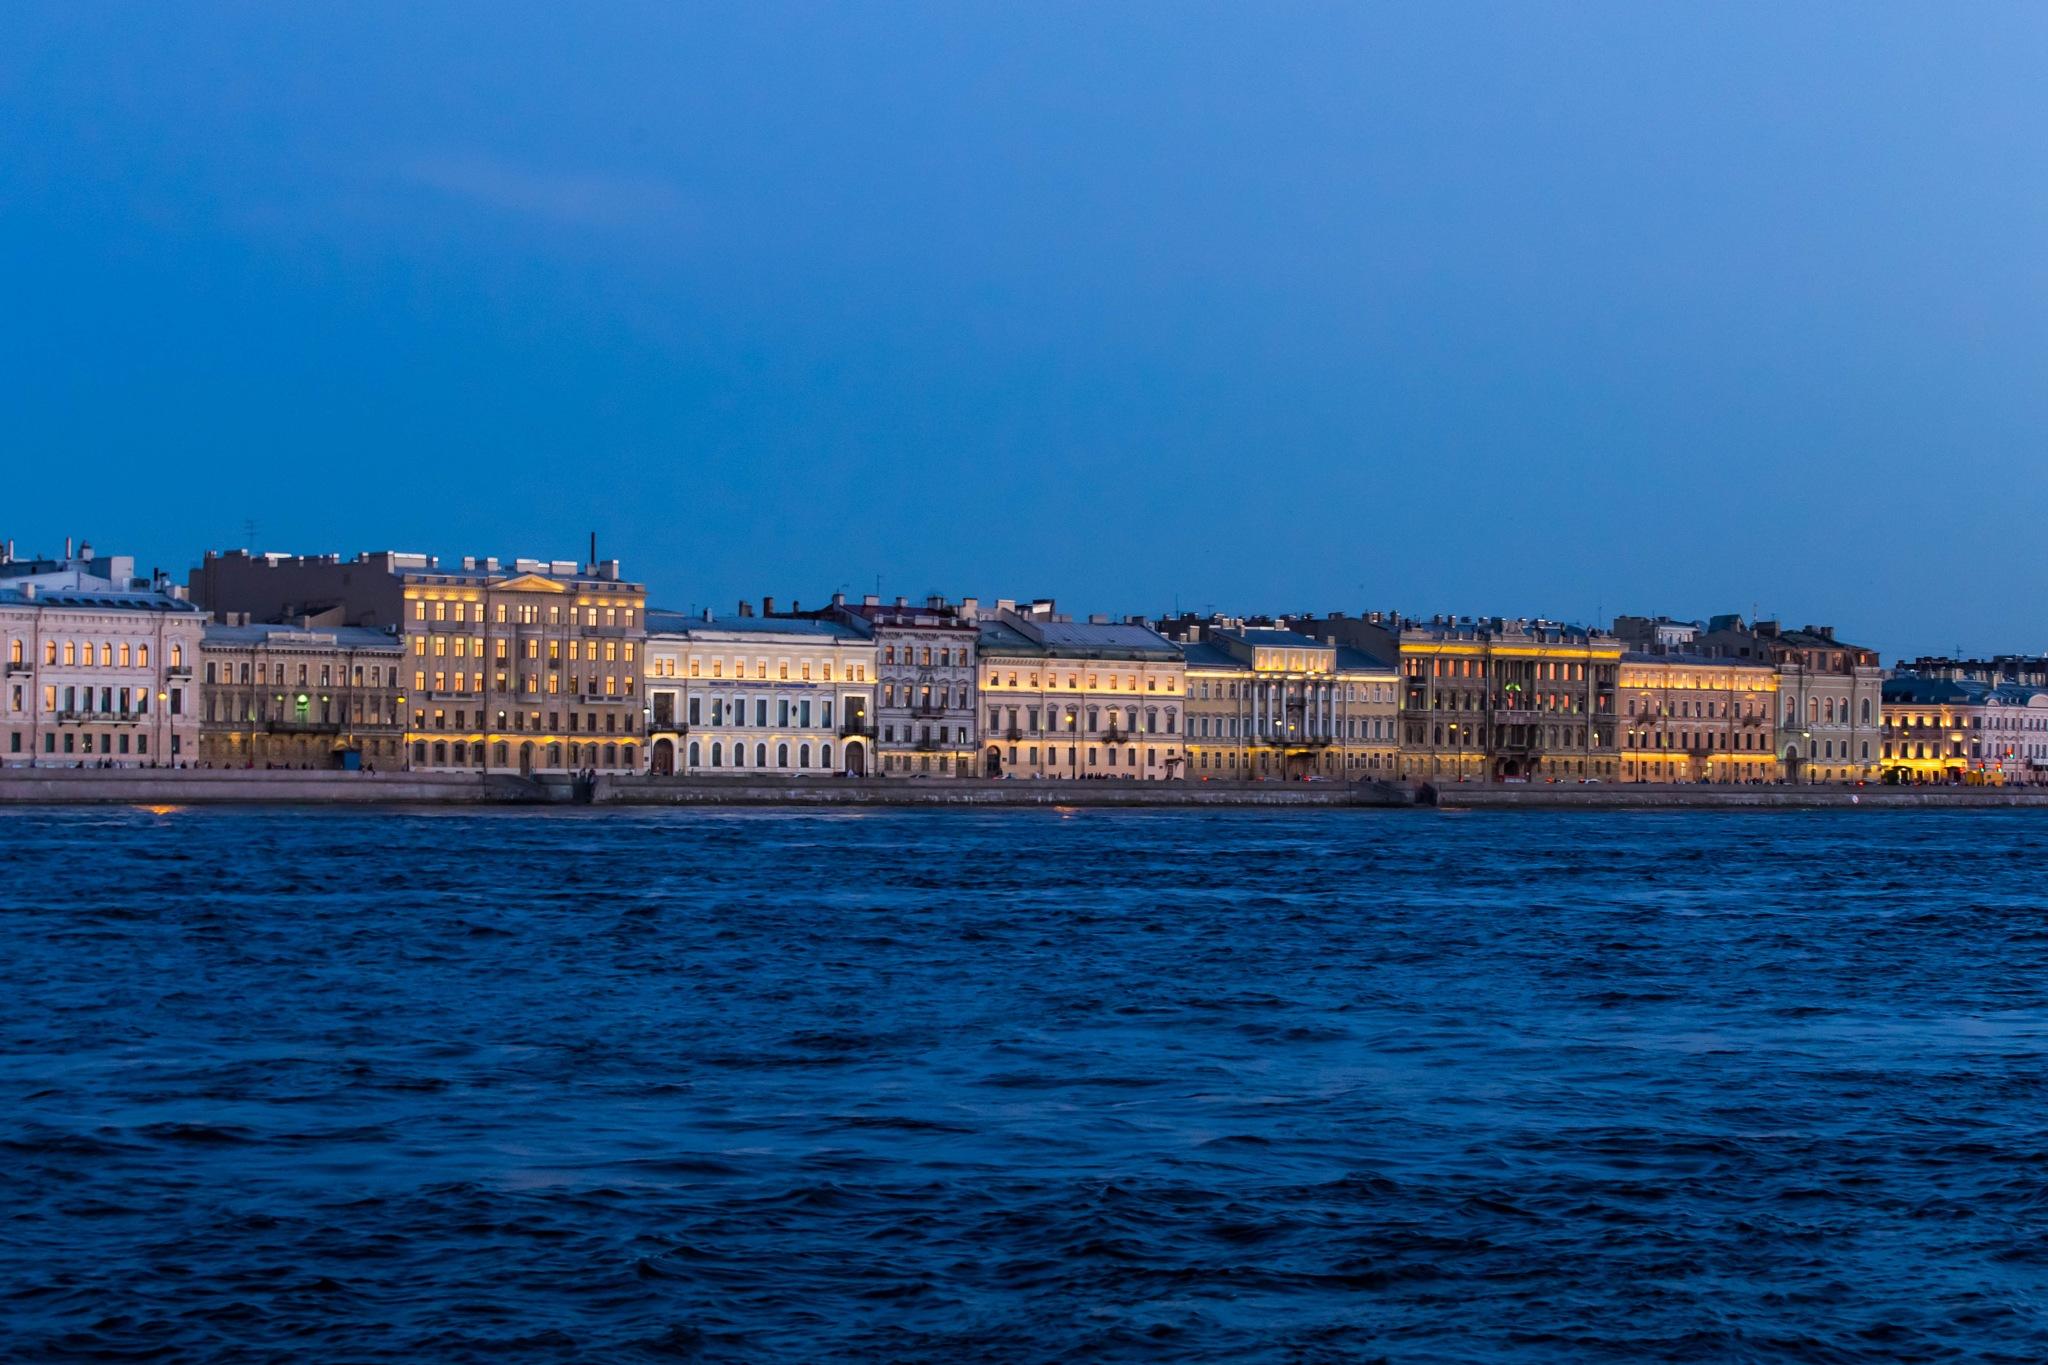 St. Petersburg embankment at dusk by aquareele